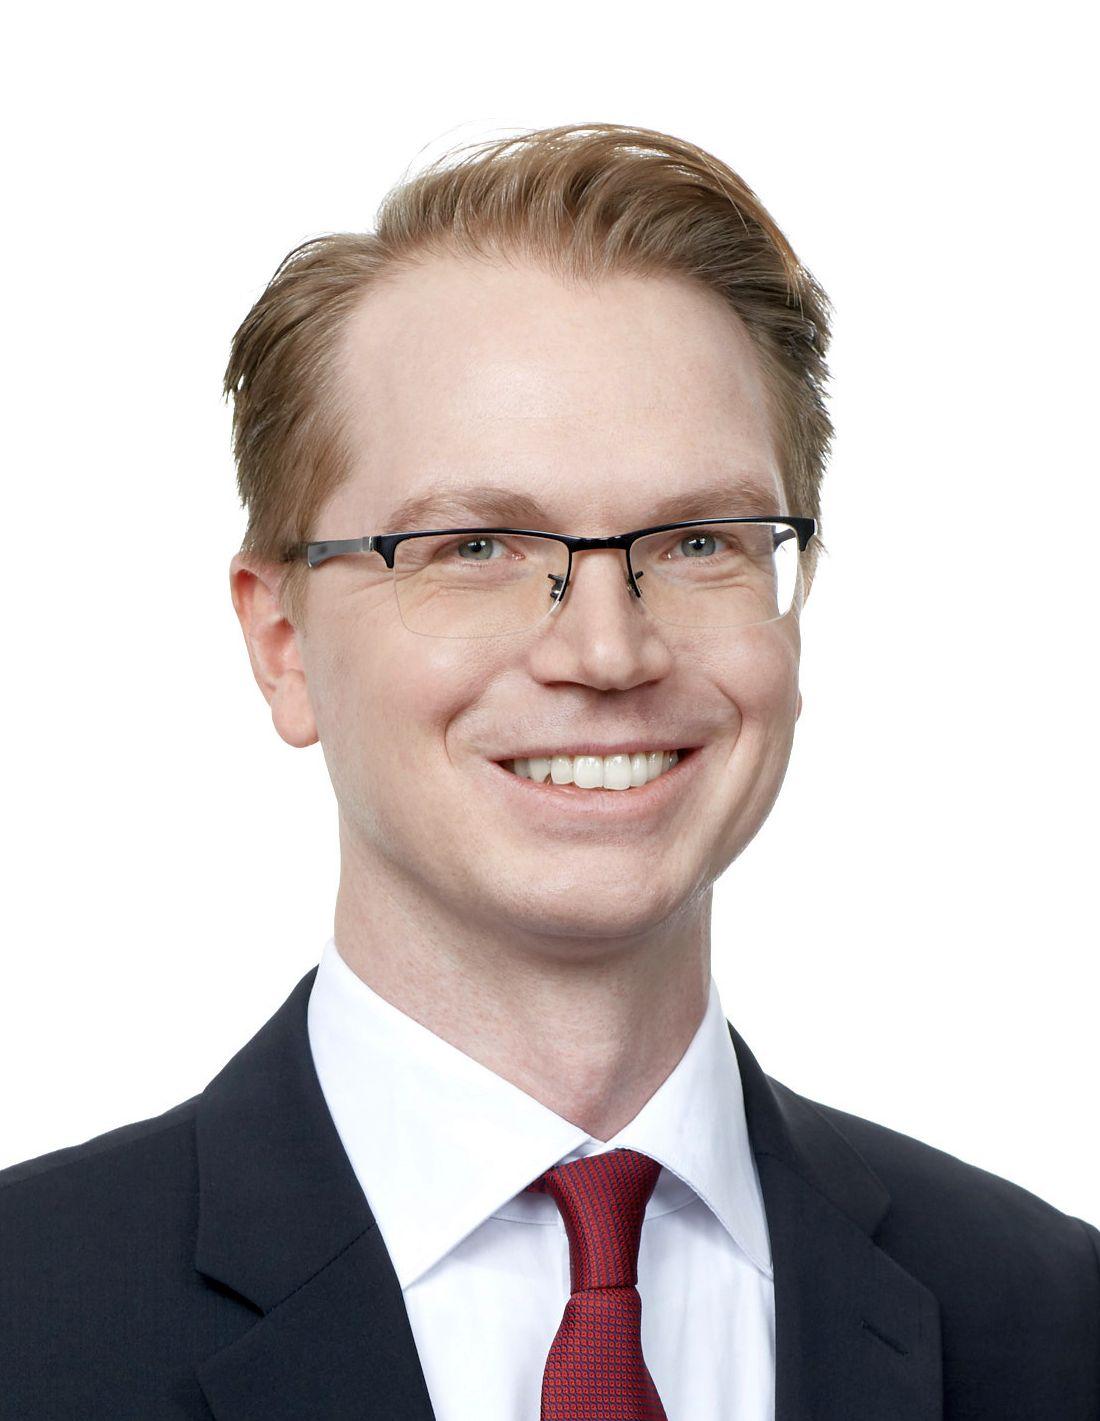 Florian Mundigler